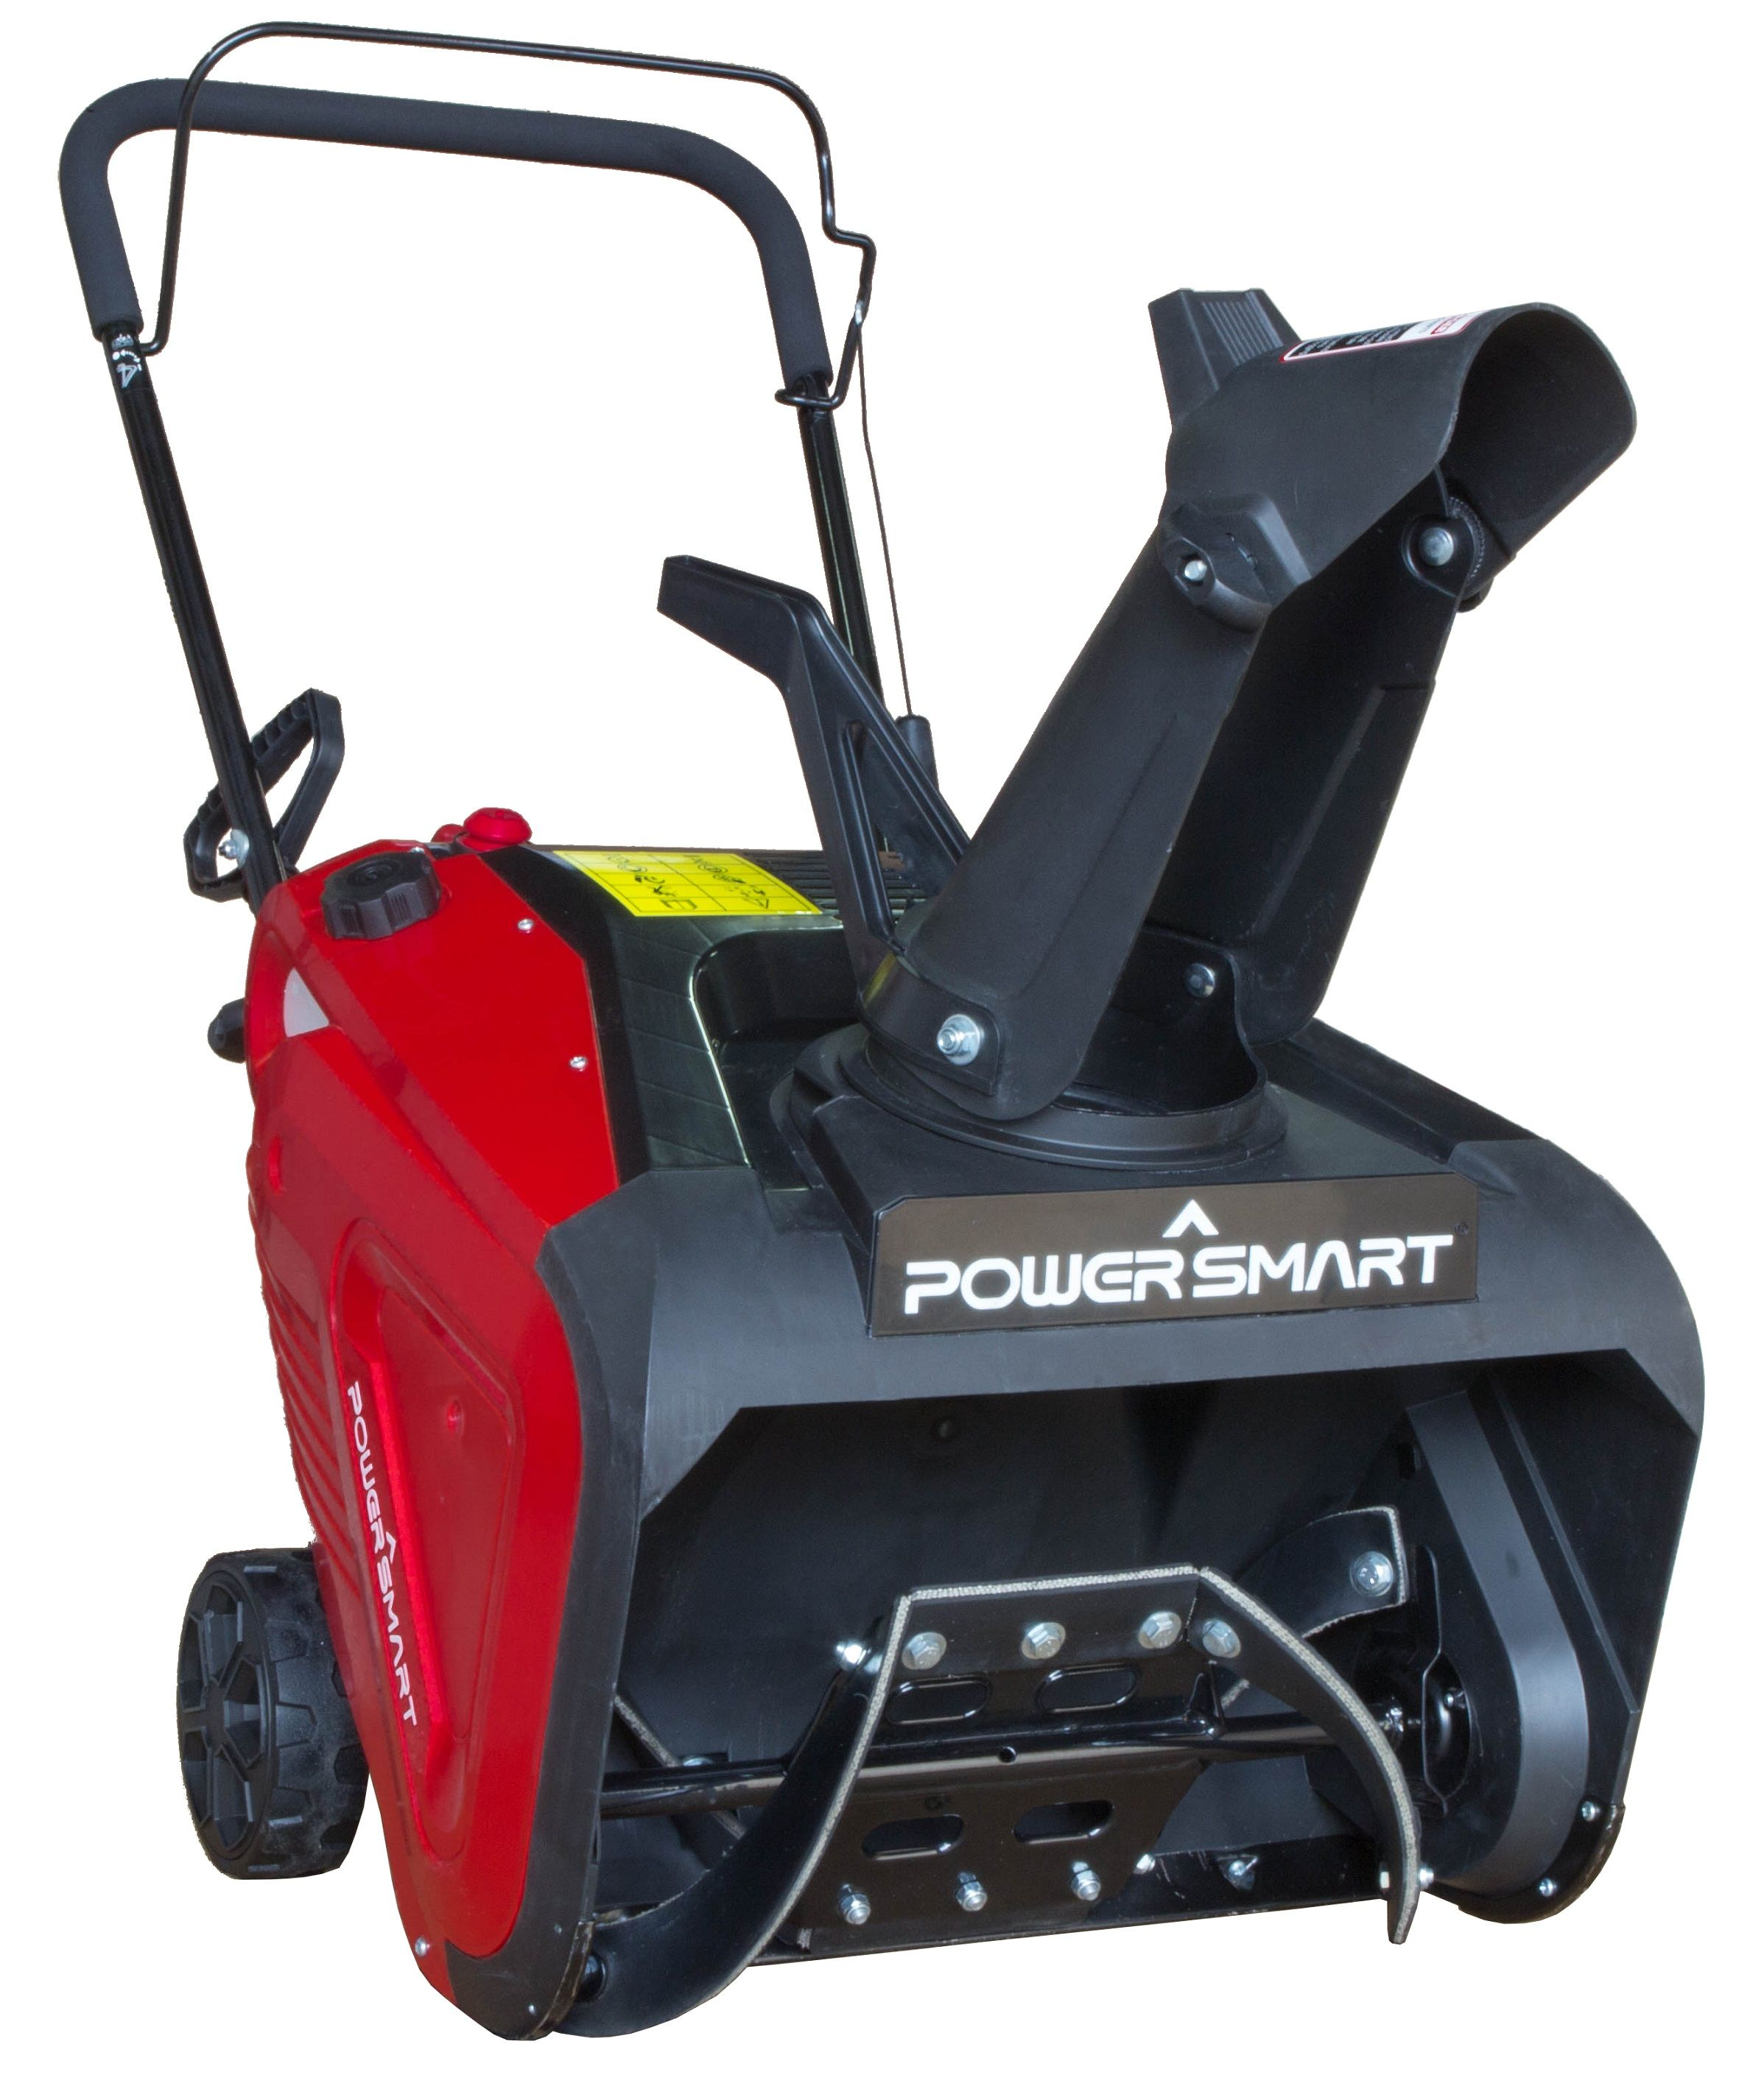 hight resolution of power smart db7005 21 196cc manual start single stage snow blower